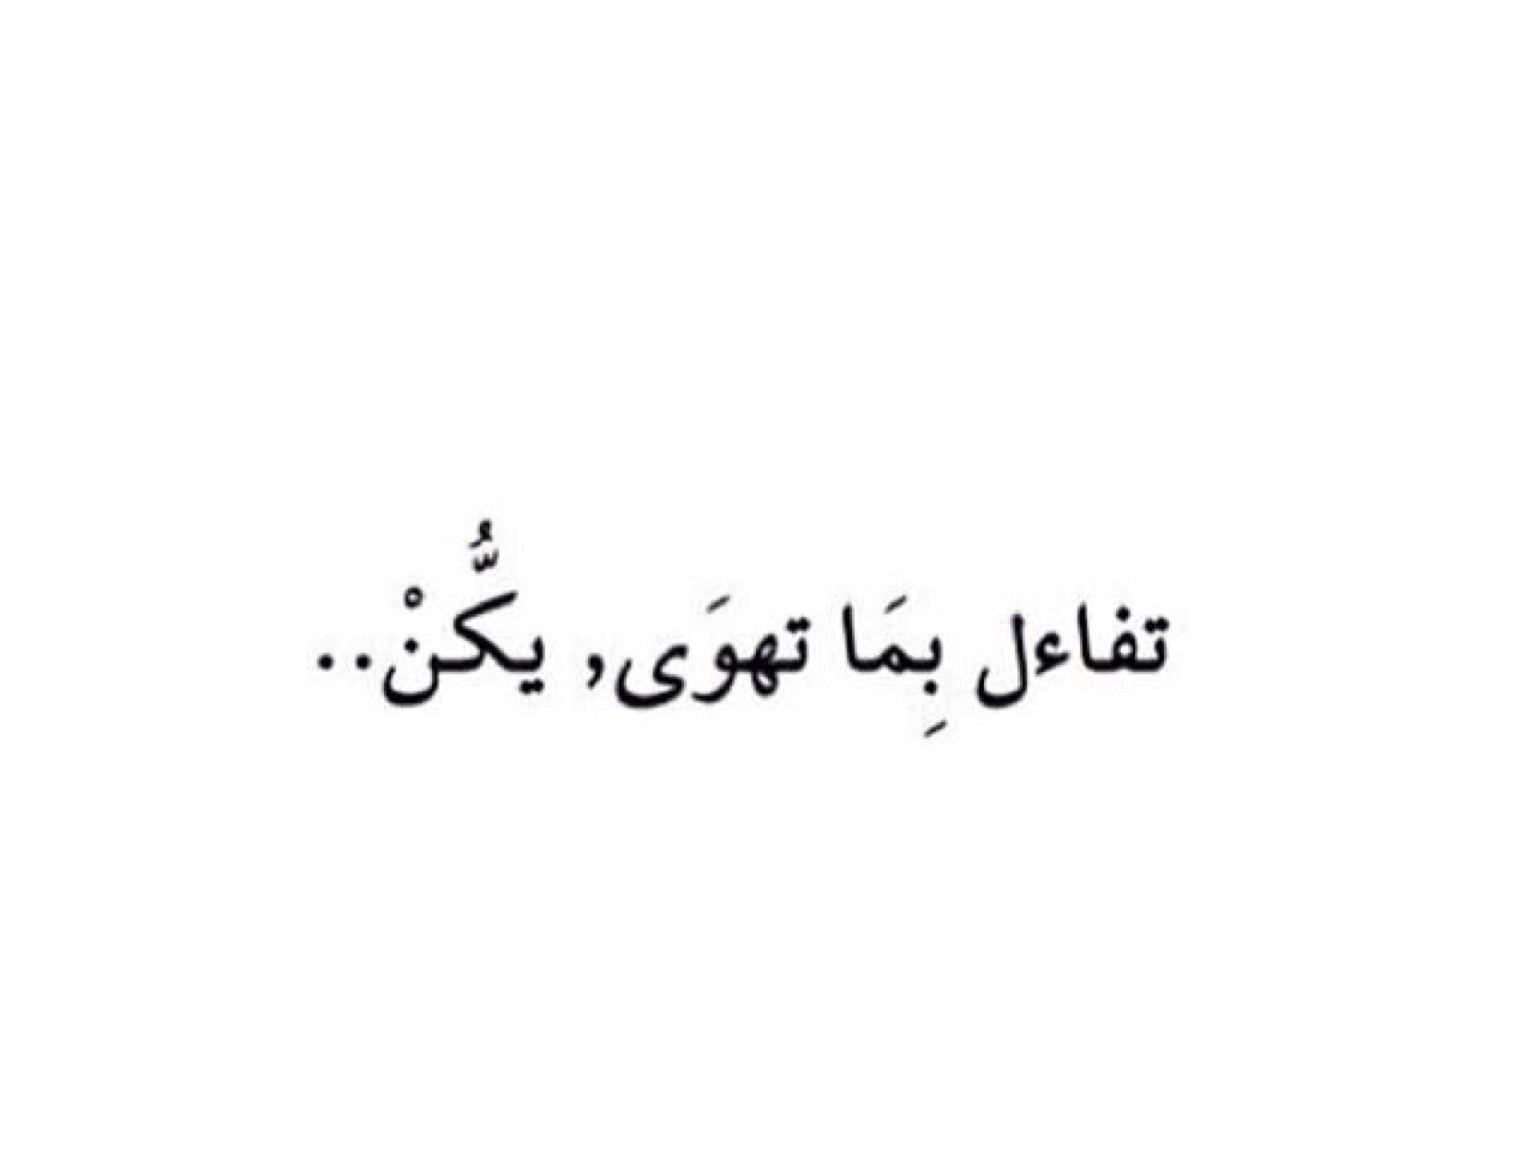 تفاؤل بما تهوى يك ن Arabic Quotes Sweet Words Happy Quotes